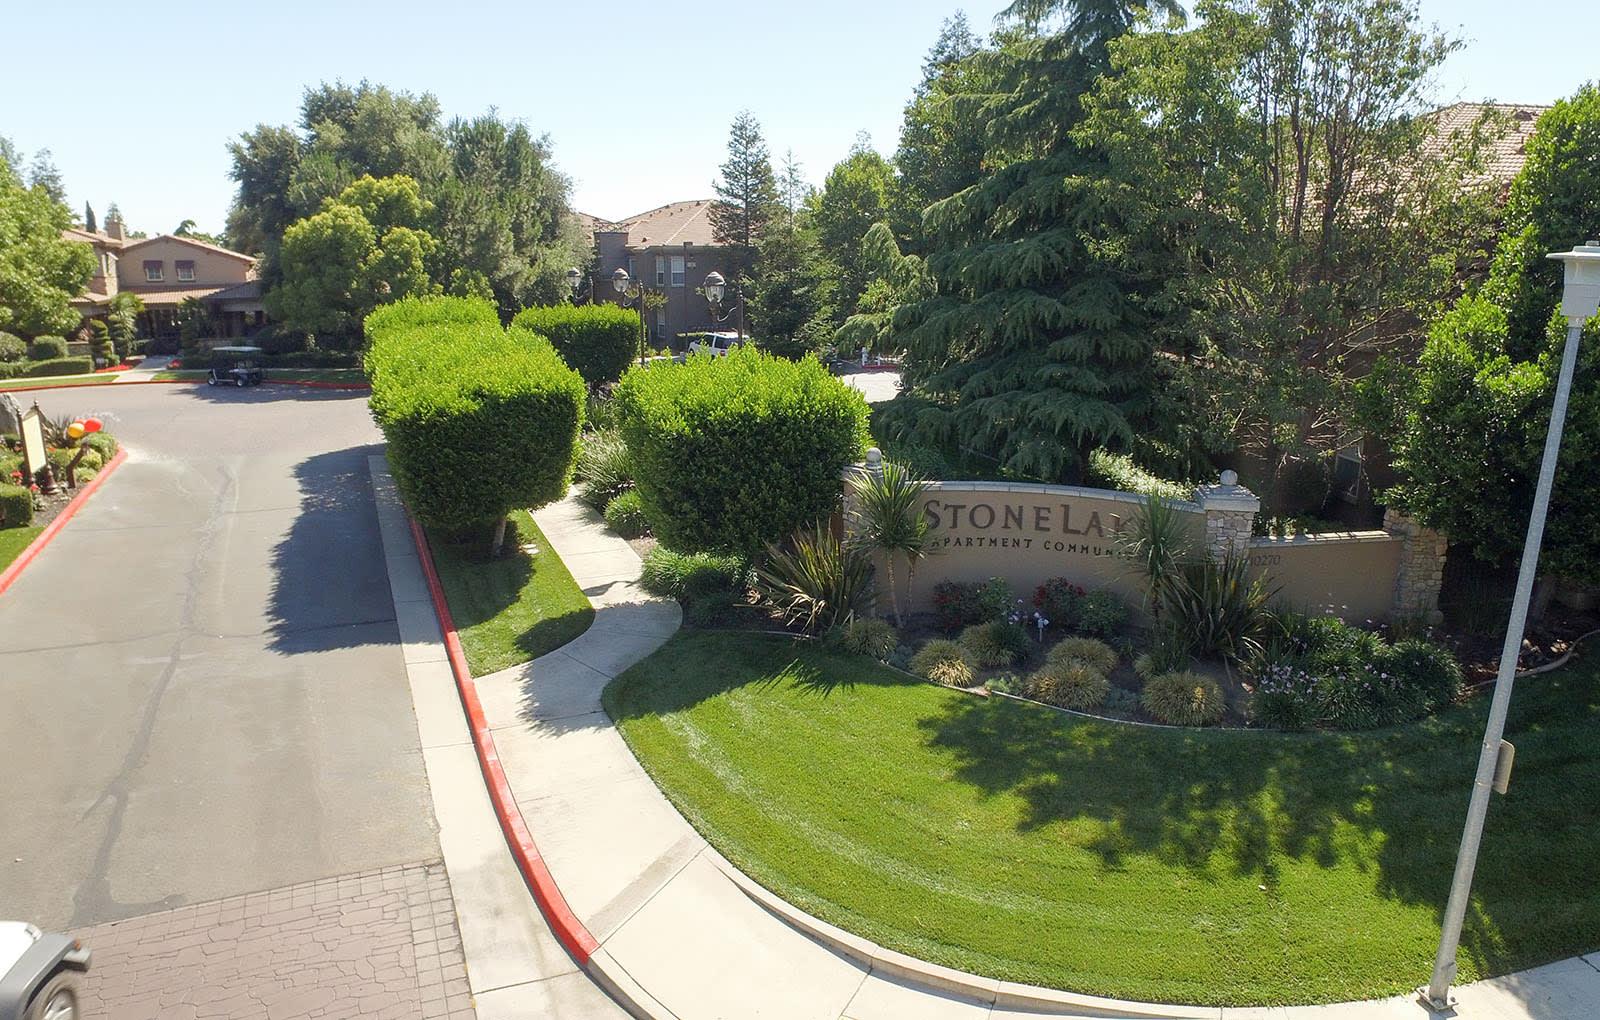 Street View l Stonelake Apartments in Elk Grove CA